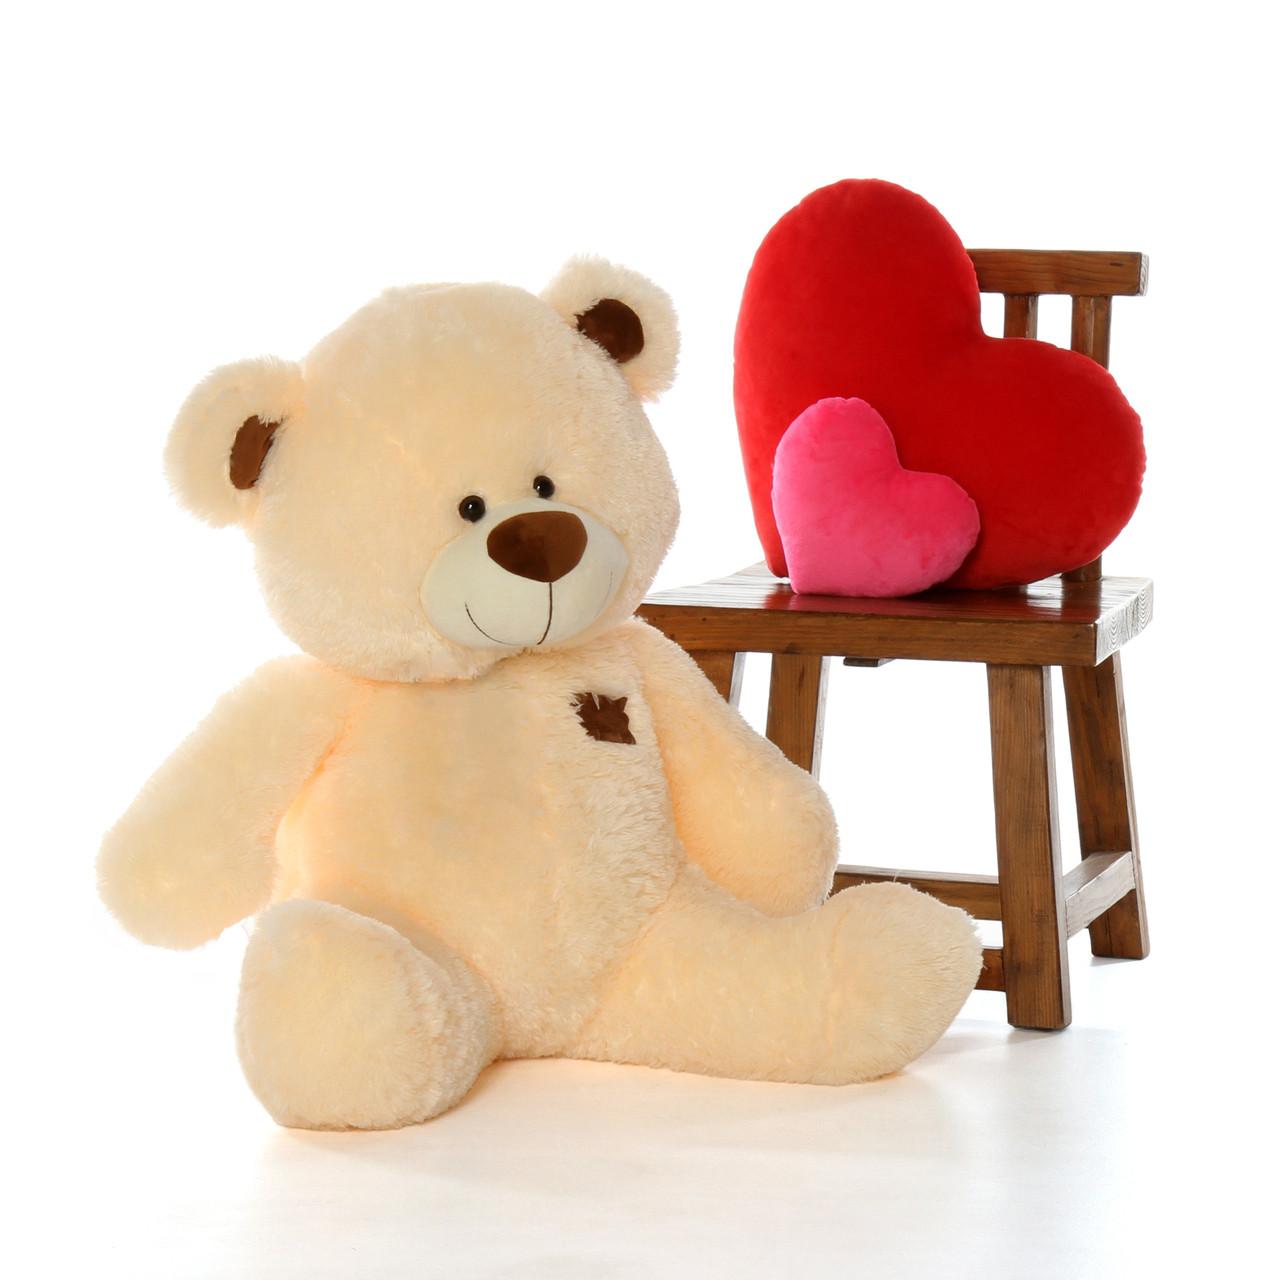 3 Foot Vanilla Giant Teddy Bear in Sitting Position